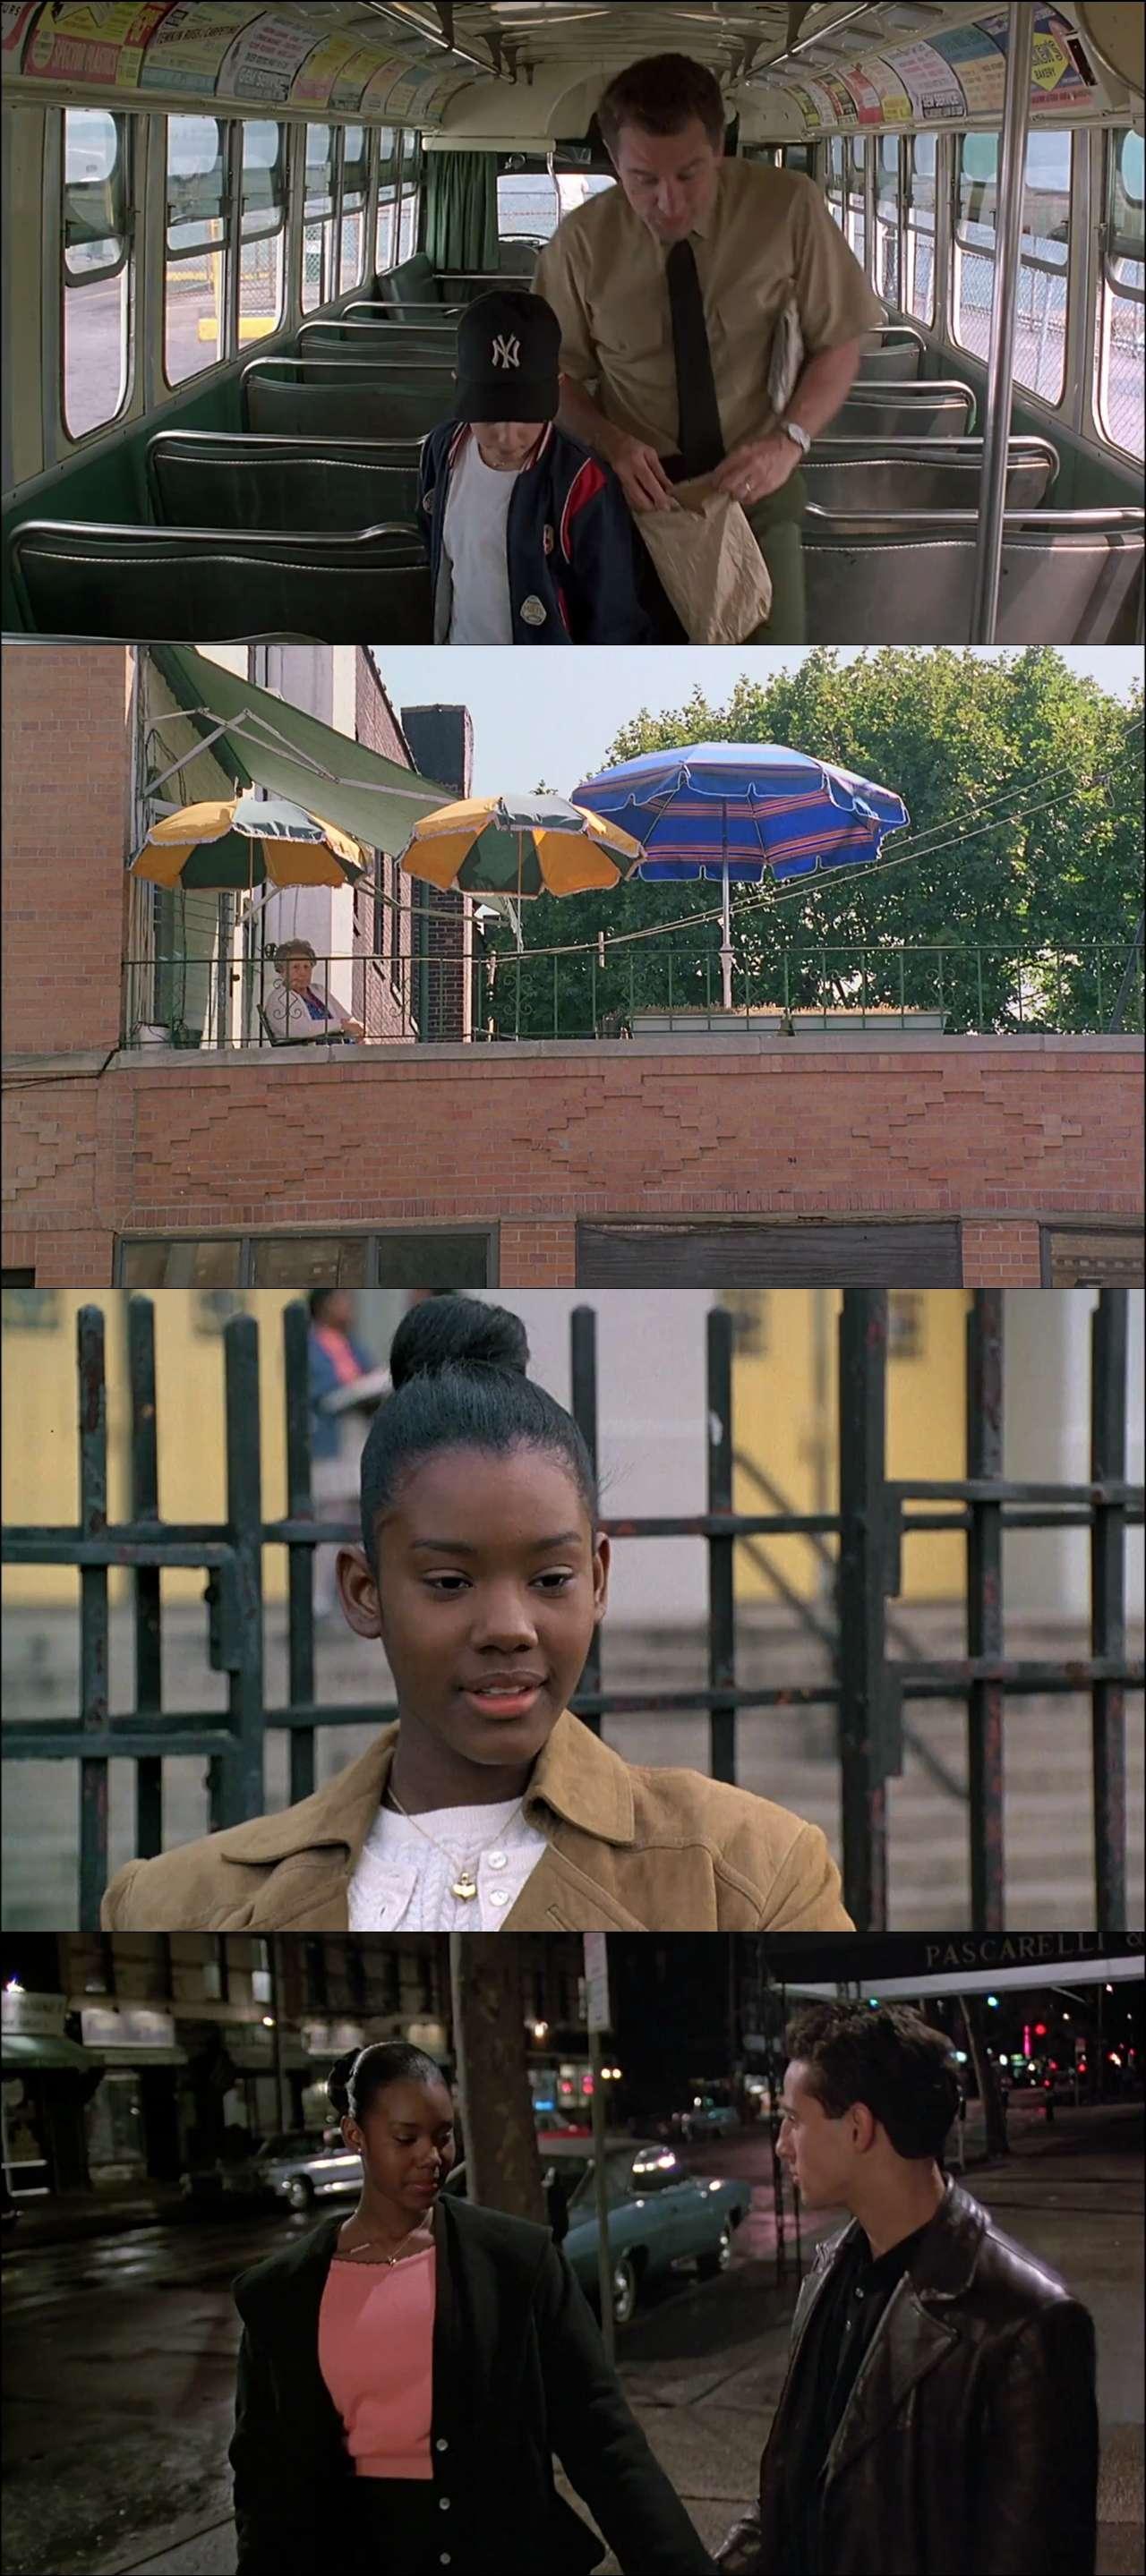 Günaha Davet - A Bronx Tale (1993) türkçe dublaj hd film indir